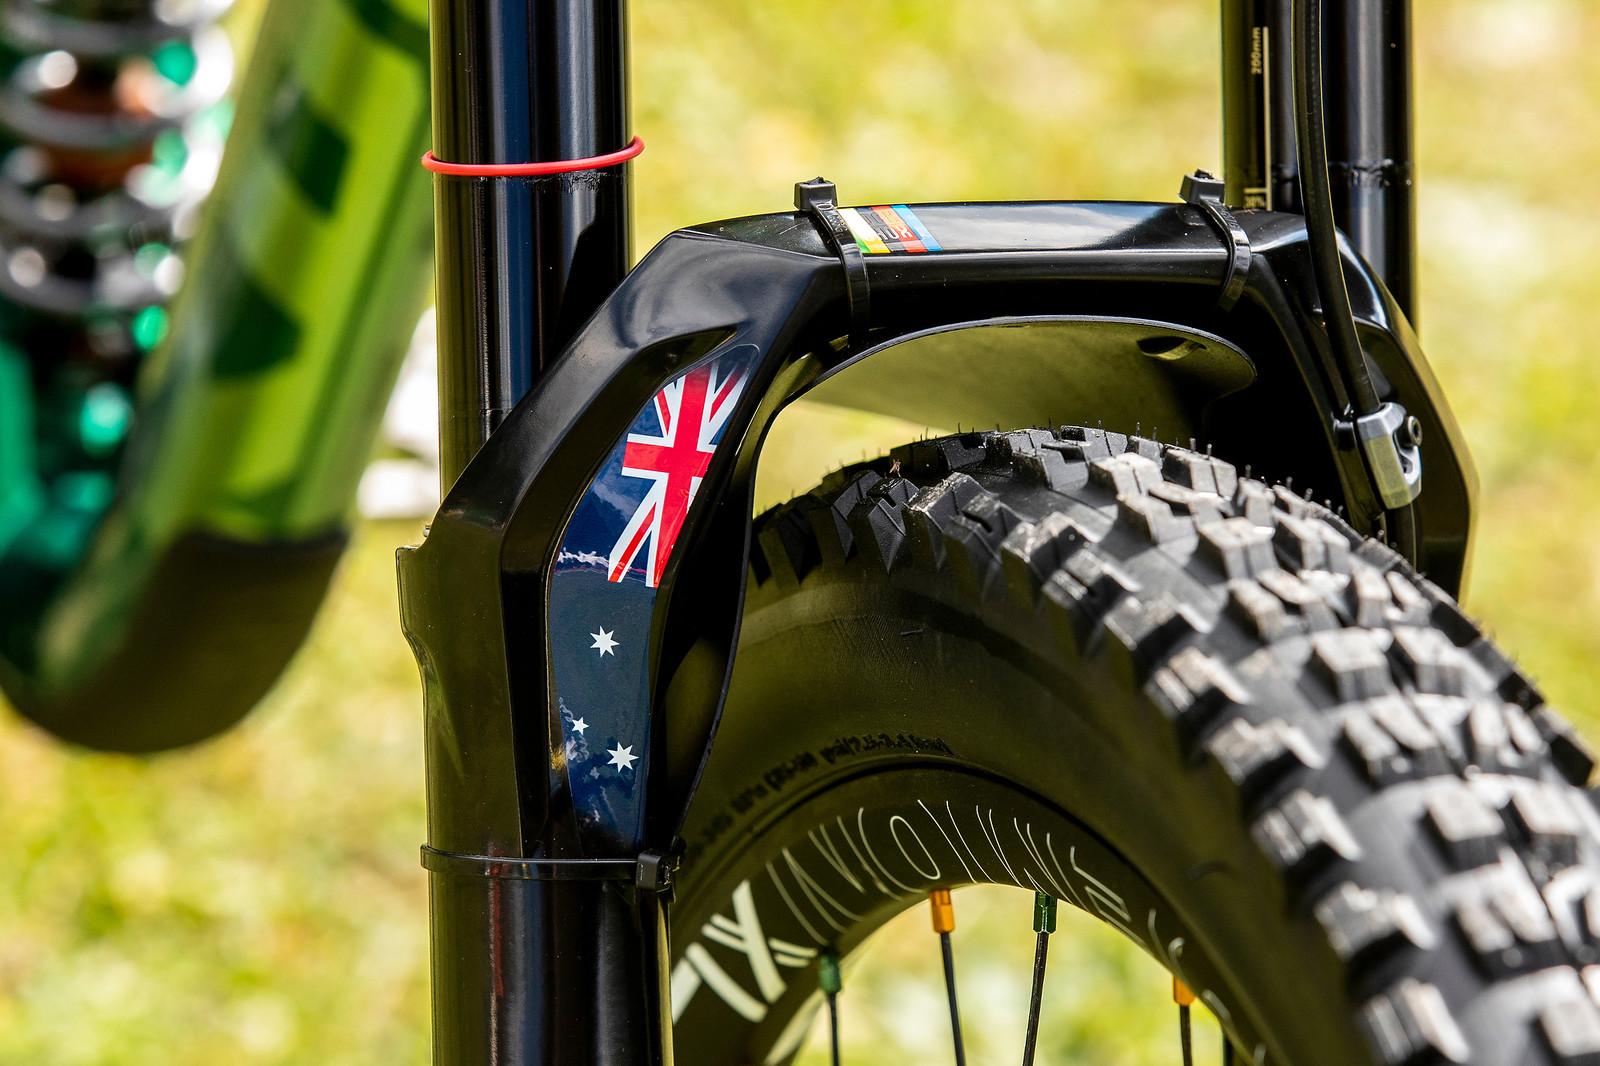 Aussie Accents - WORLD CHAMPS BIKE - Connor Fearon's Kona Operator - Mountain Biking Pictures - Vital MTB